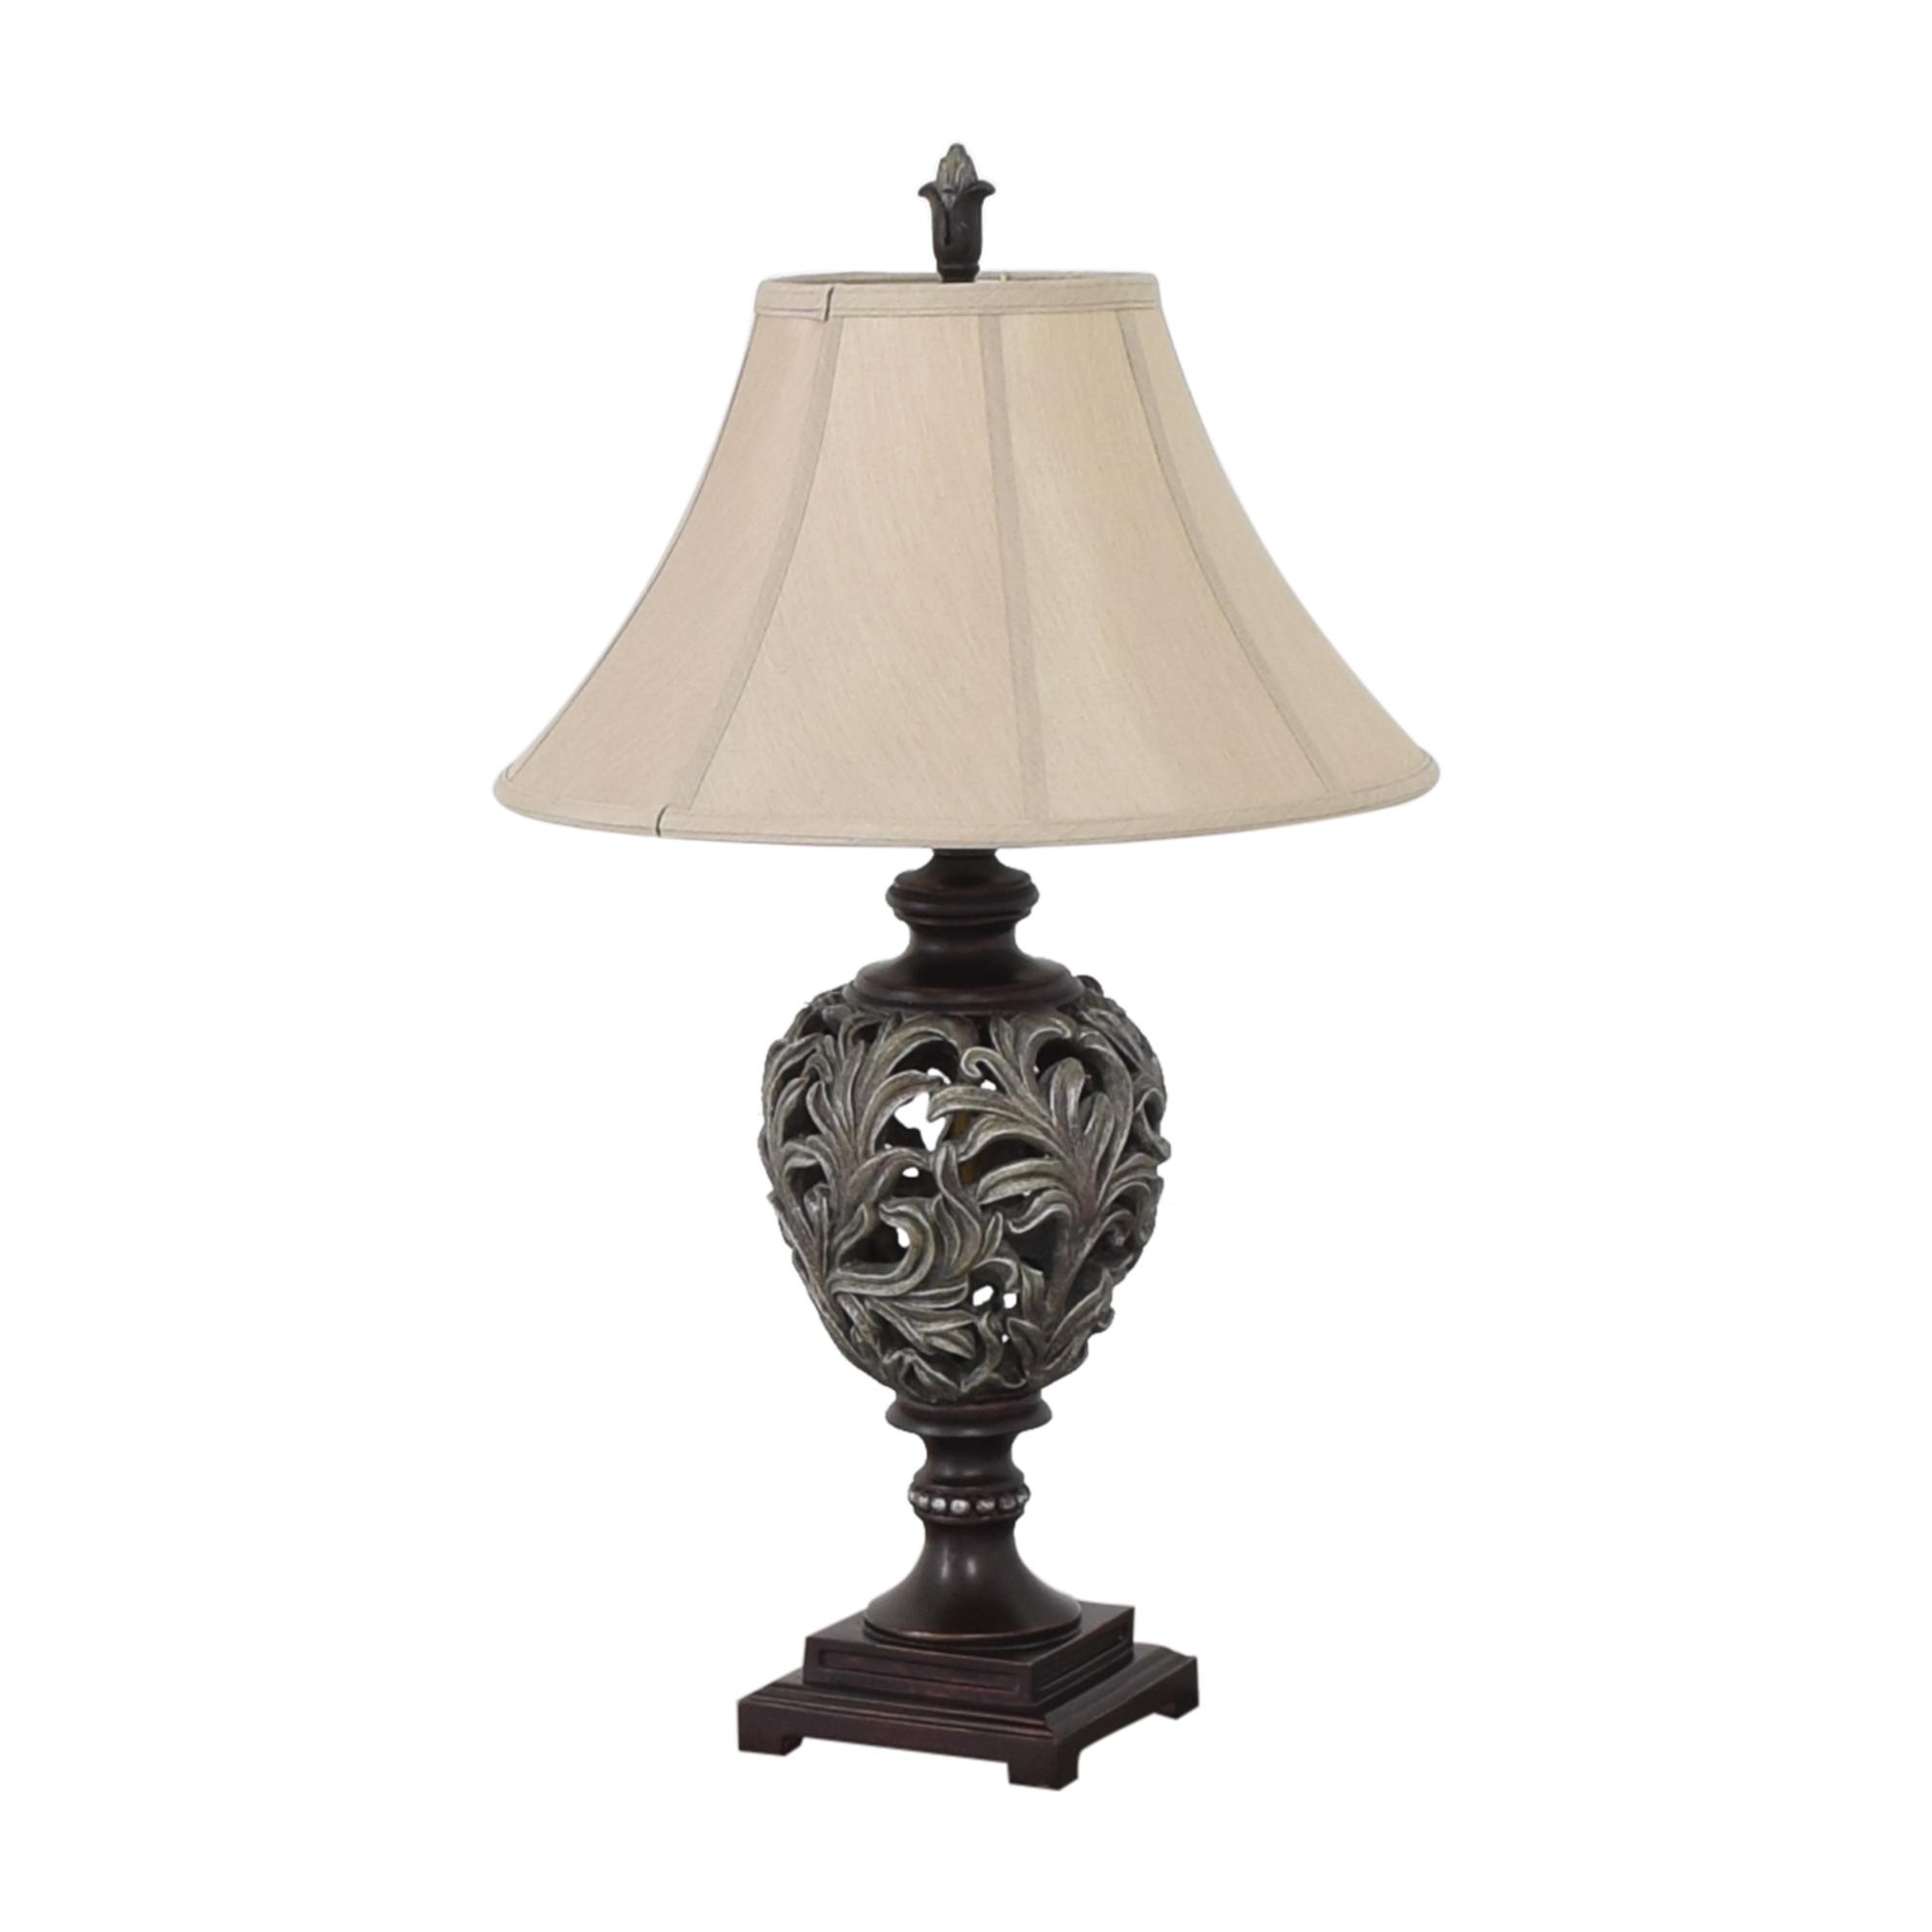 44 off ashley furniture ashley furniture deborah table lamp decor